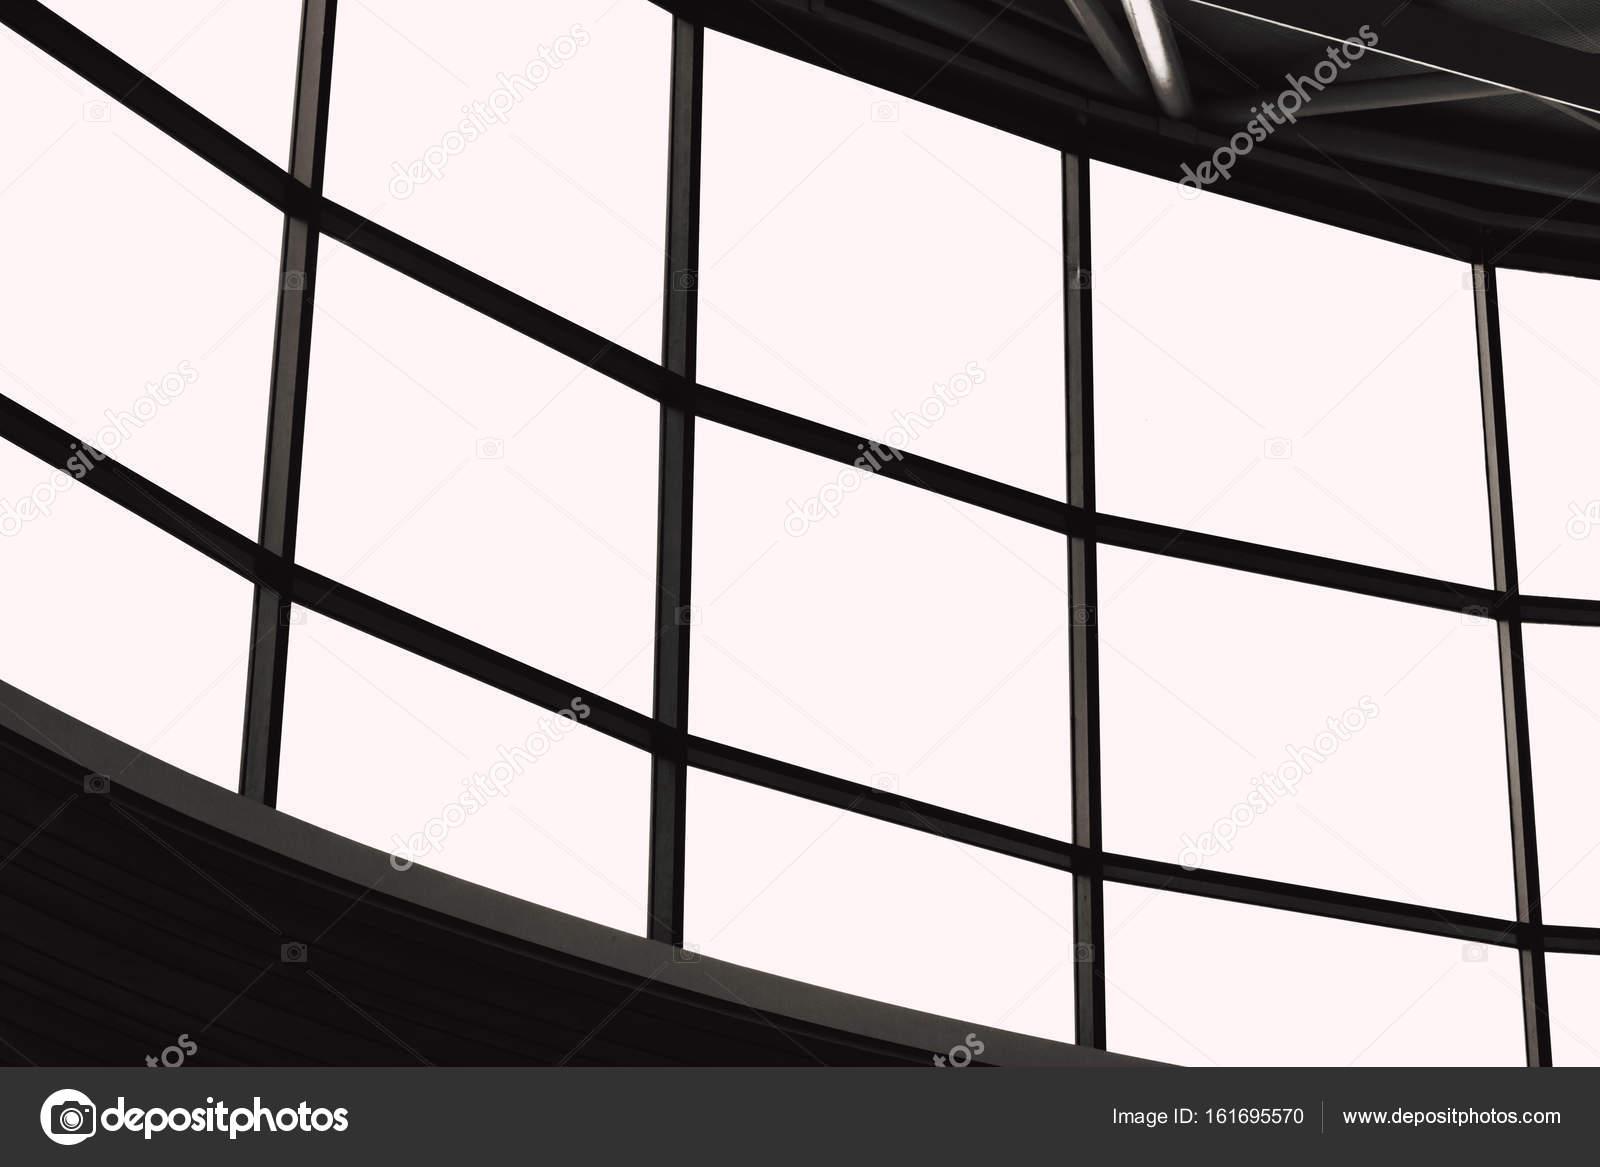 panel de ventanales o pantalla de visualización de múltiples en un ...